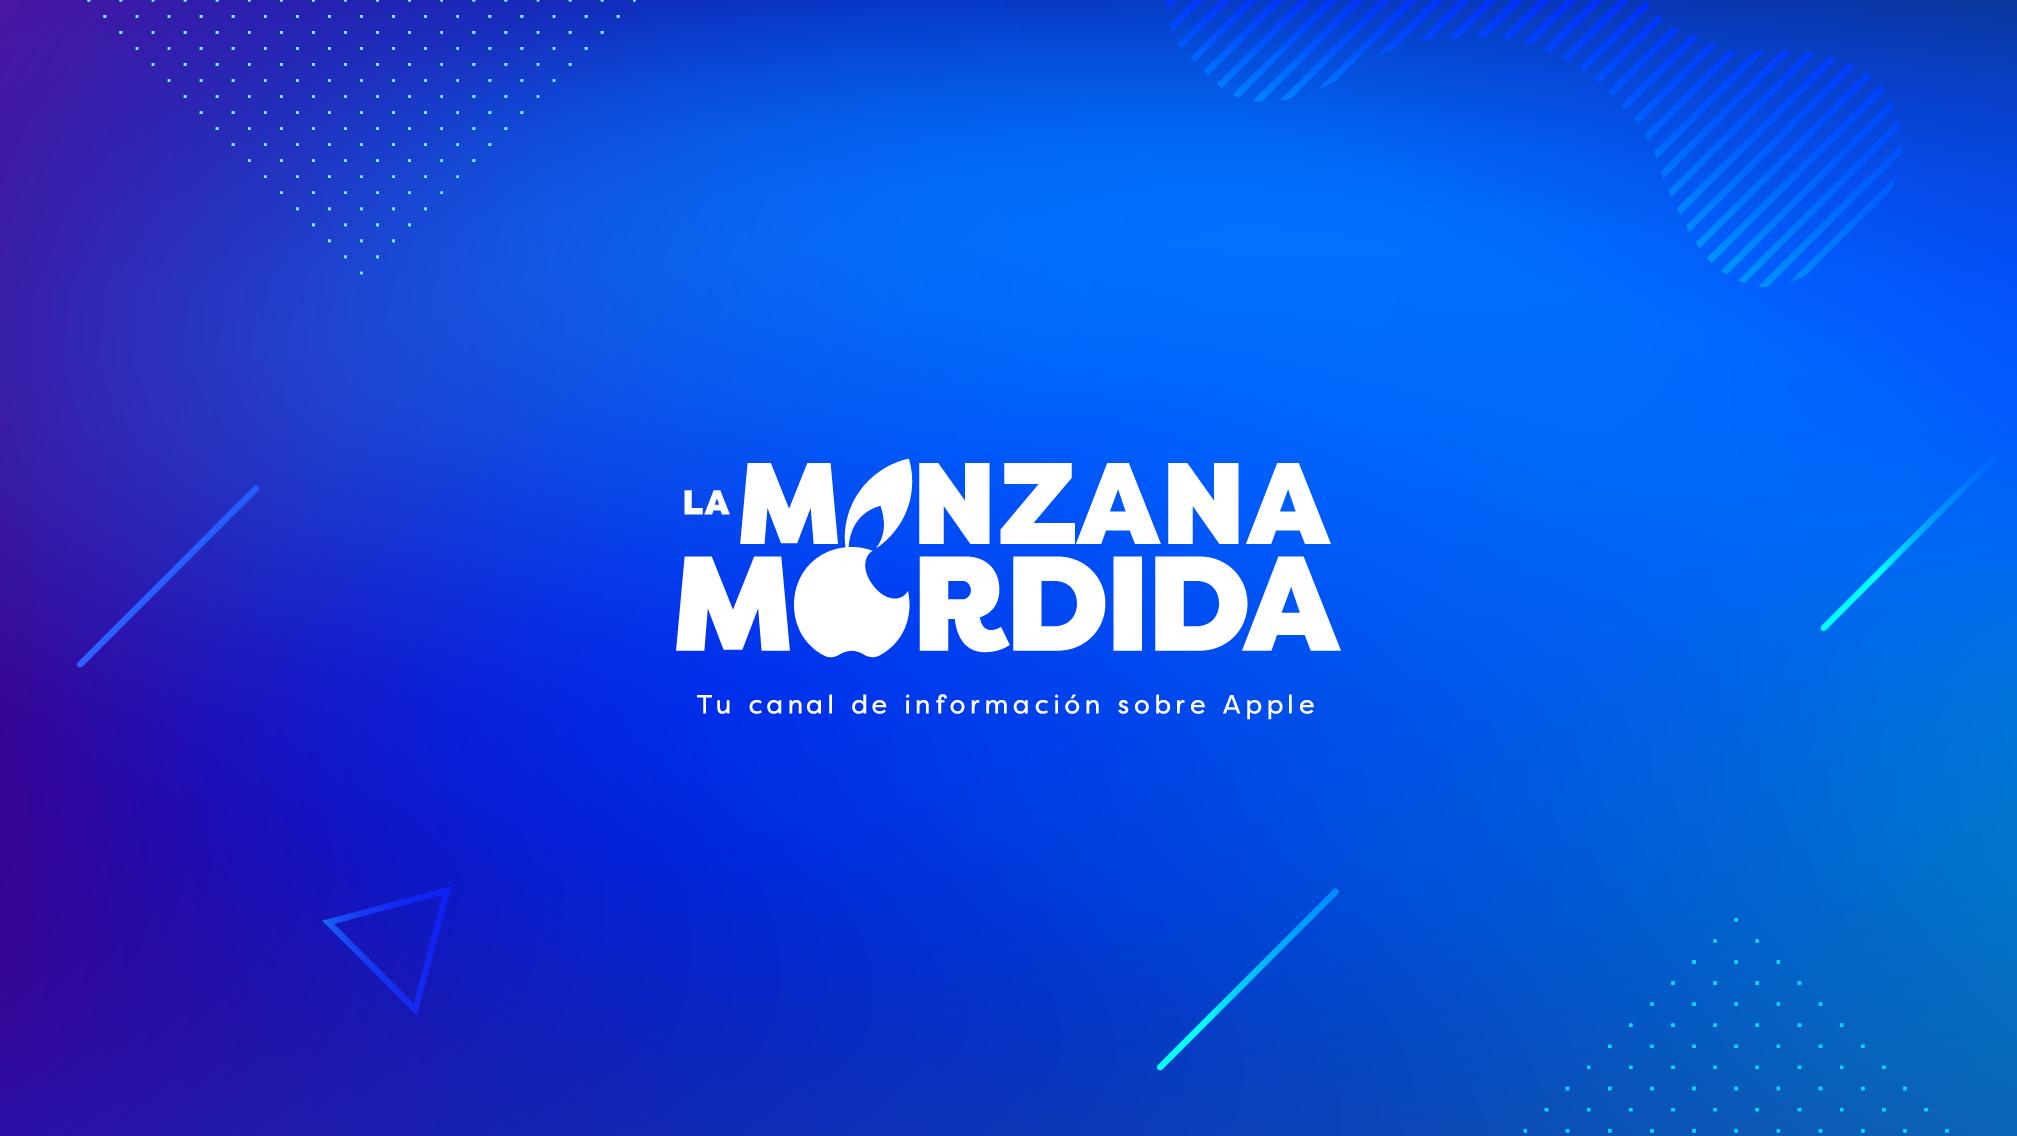 La Manzana Mordida 2018